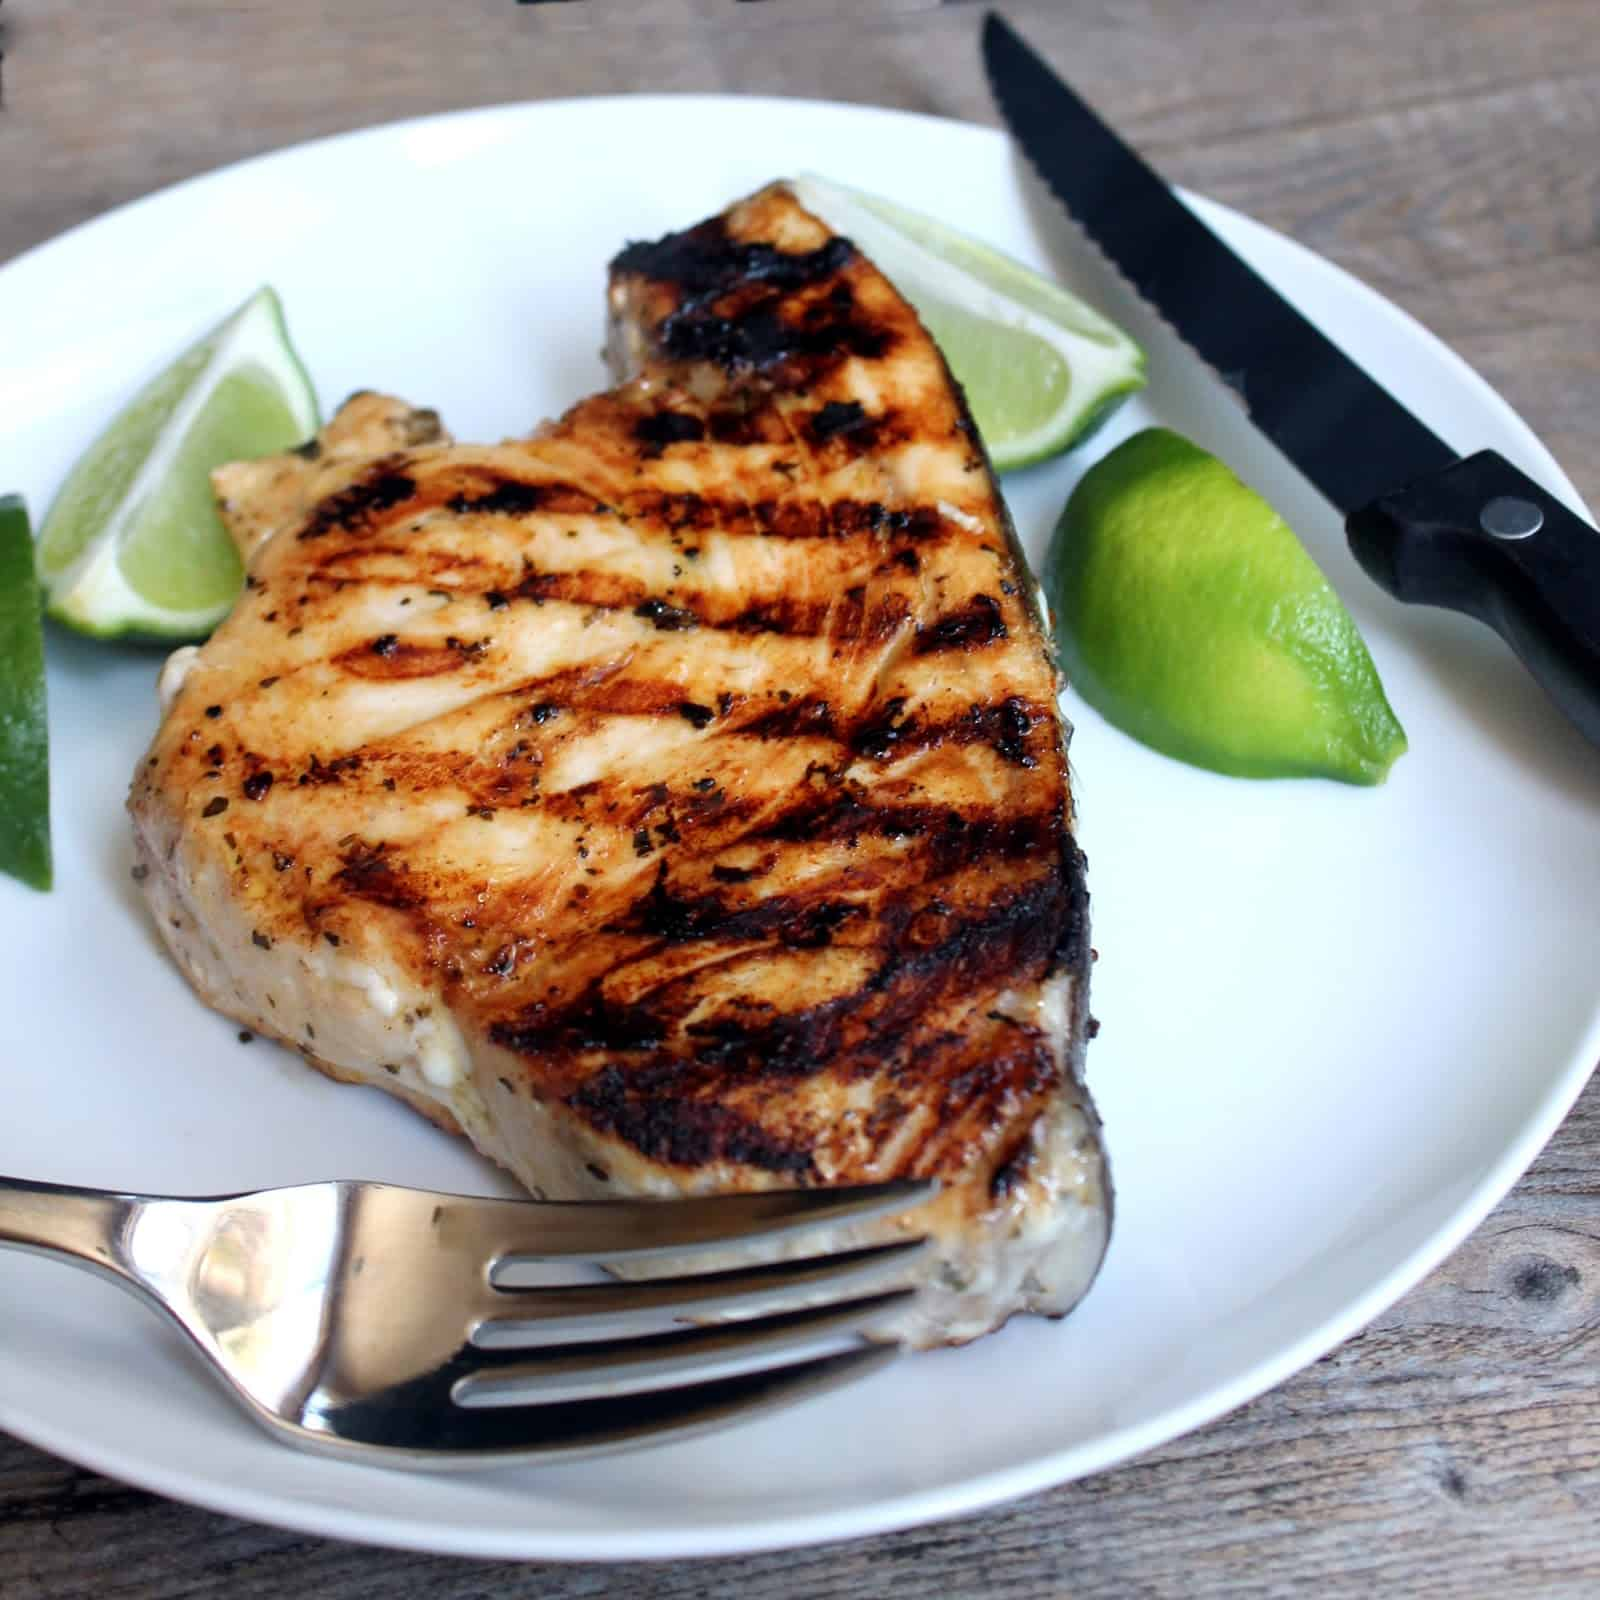 Grilled Swordfish Steak with Lemon-Dill Aioli Sauce ...   Broiled Swordfish